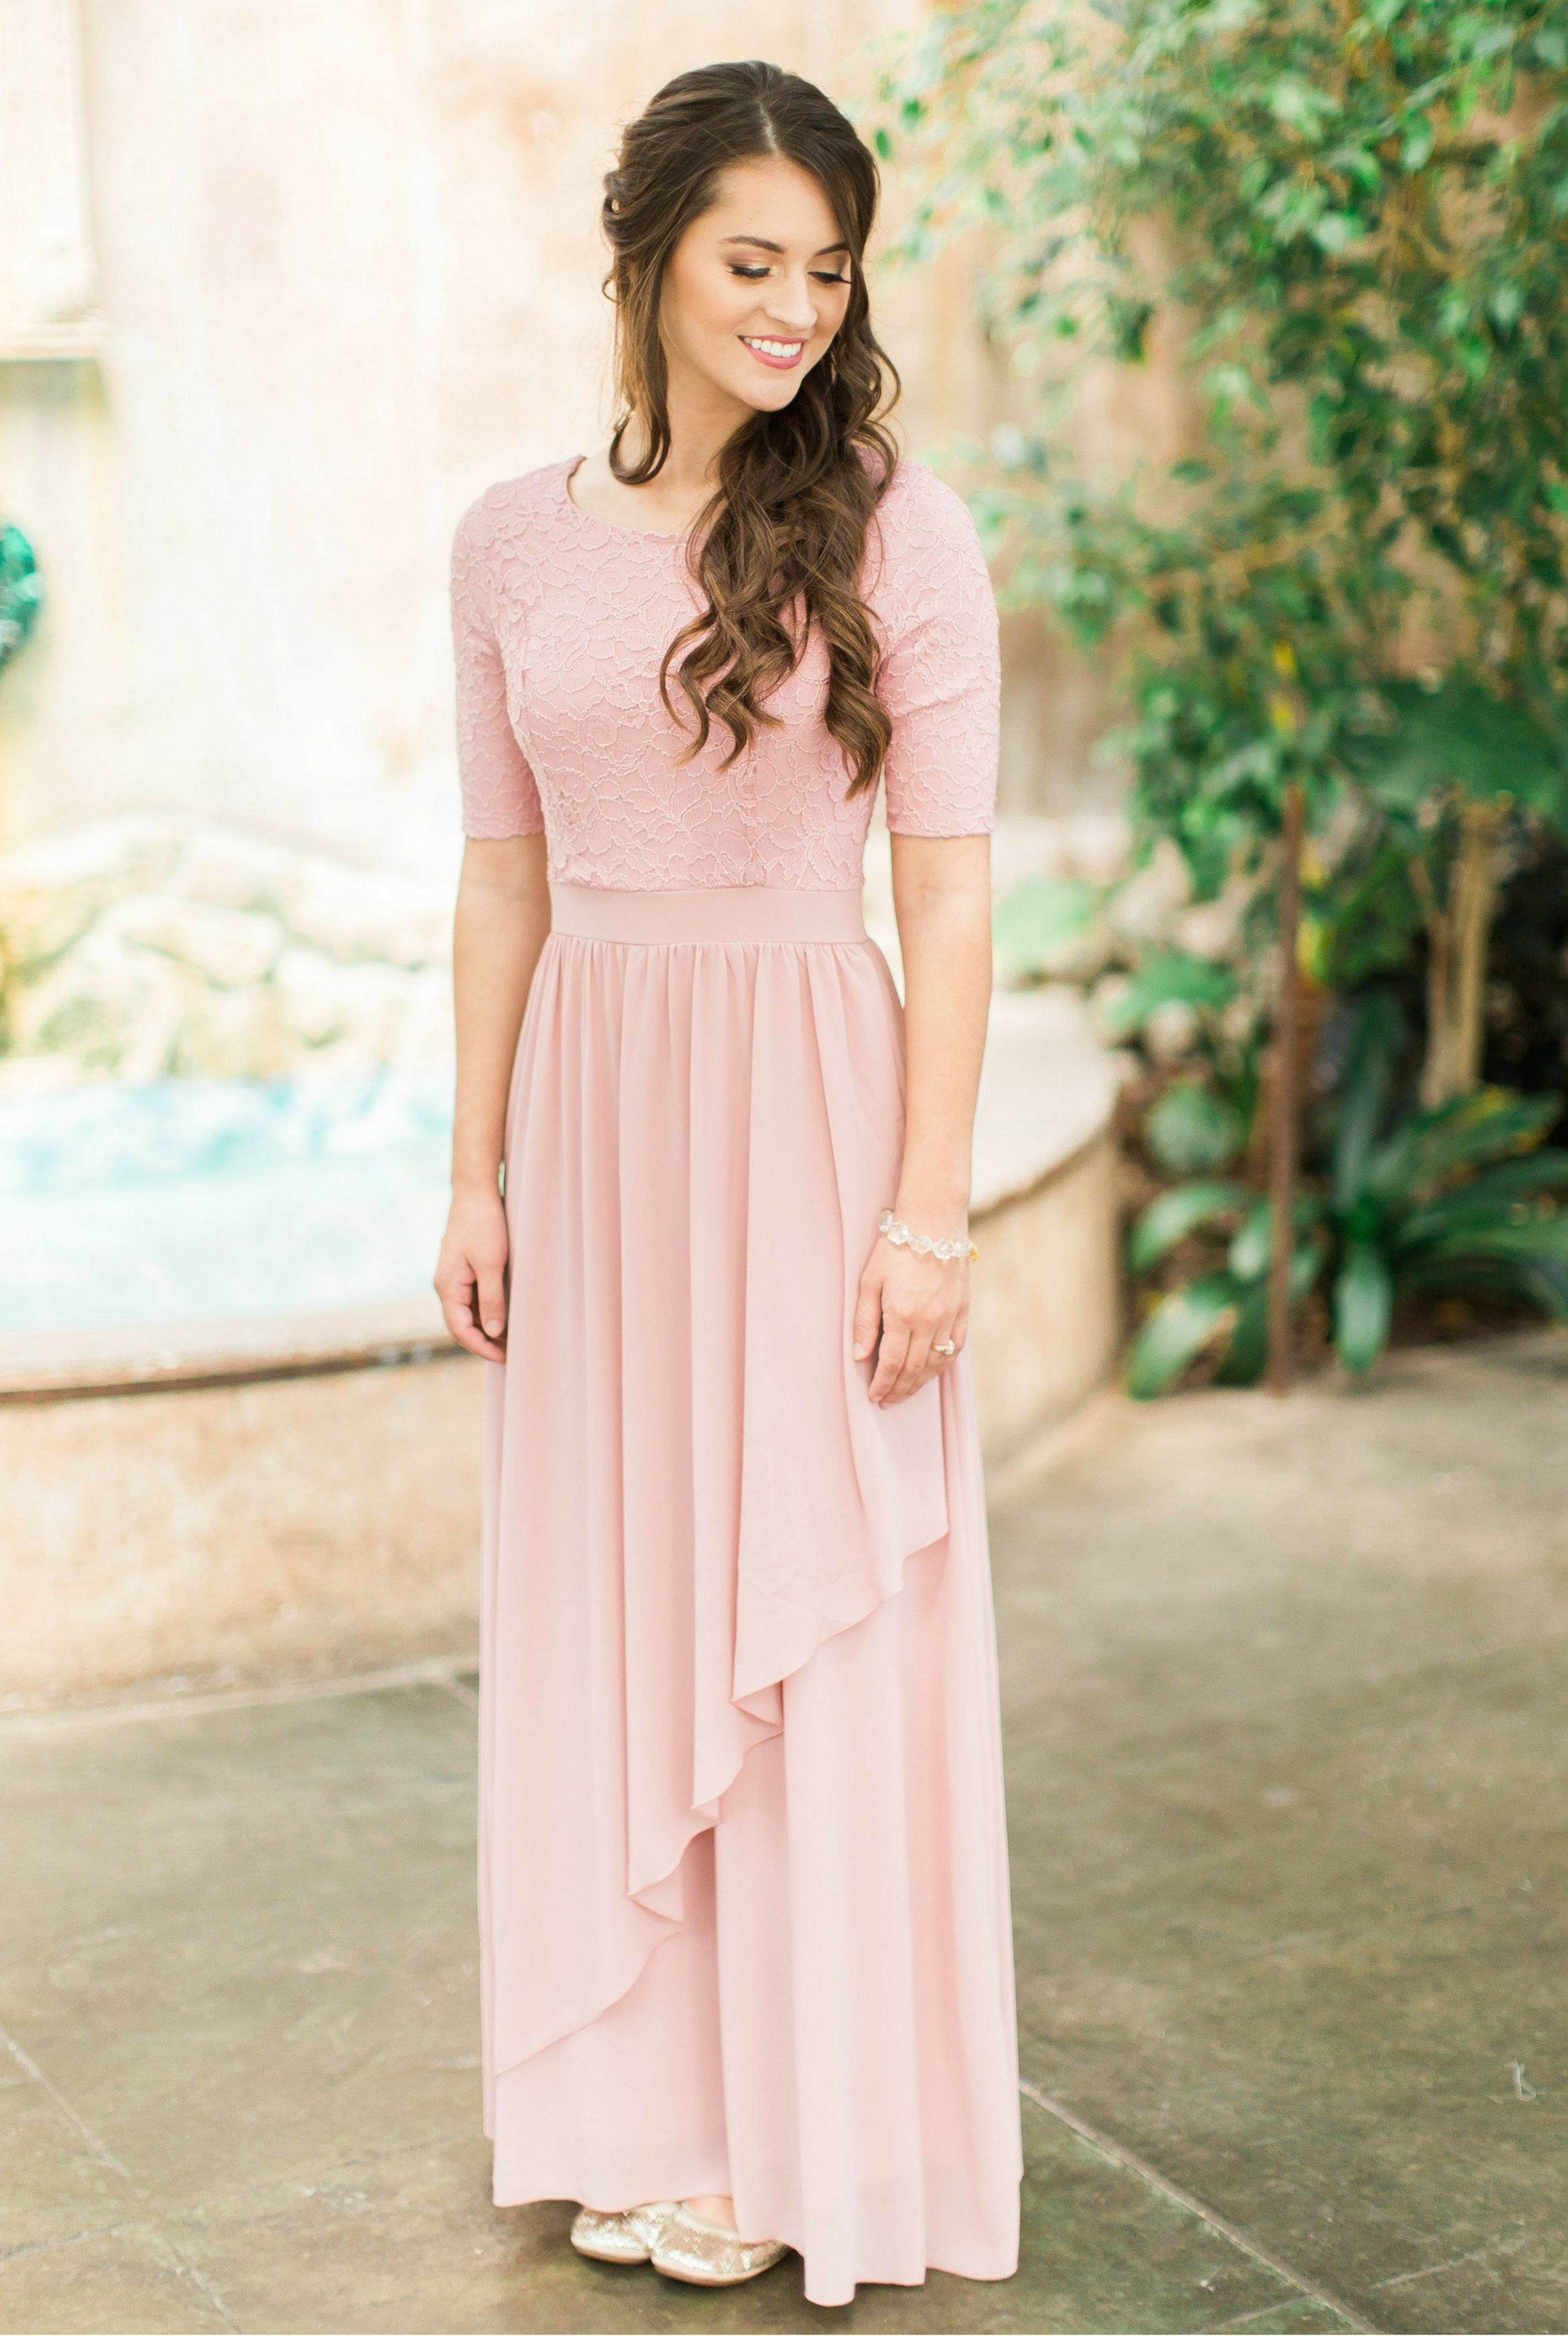 MW24350 | Allie\'s bridesmaid dress | Pinterest